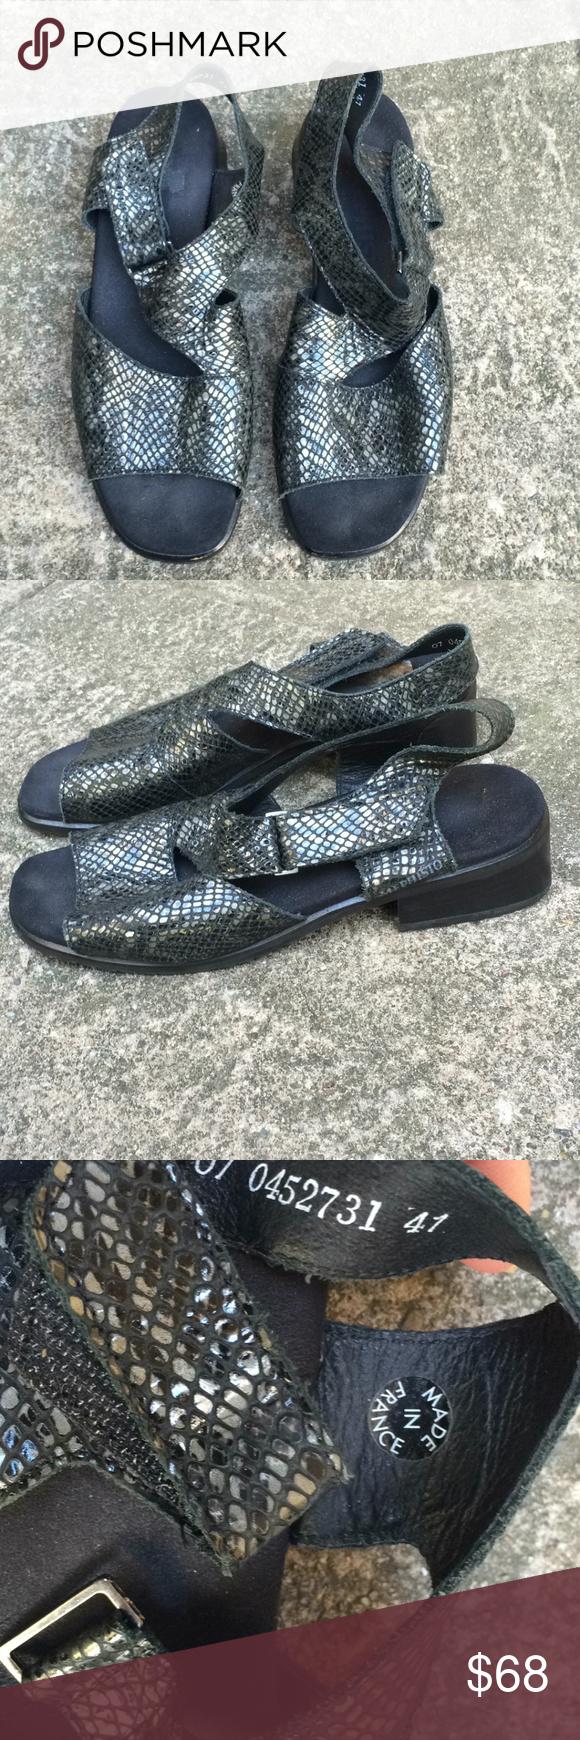 Mephisto snakeskin ankle strap sandals. Size 41/10 Genuine